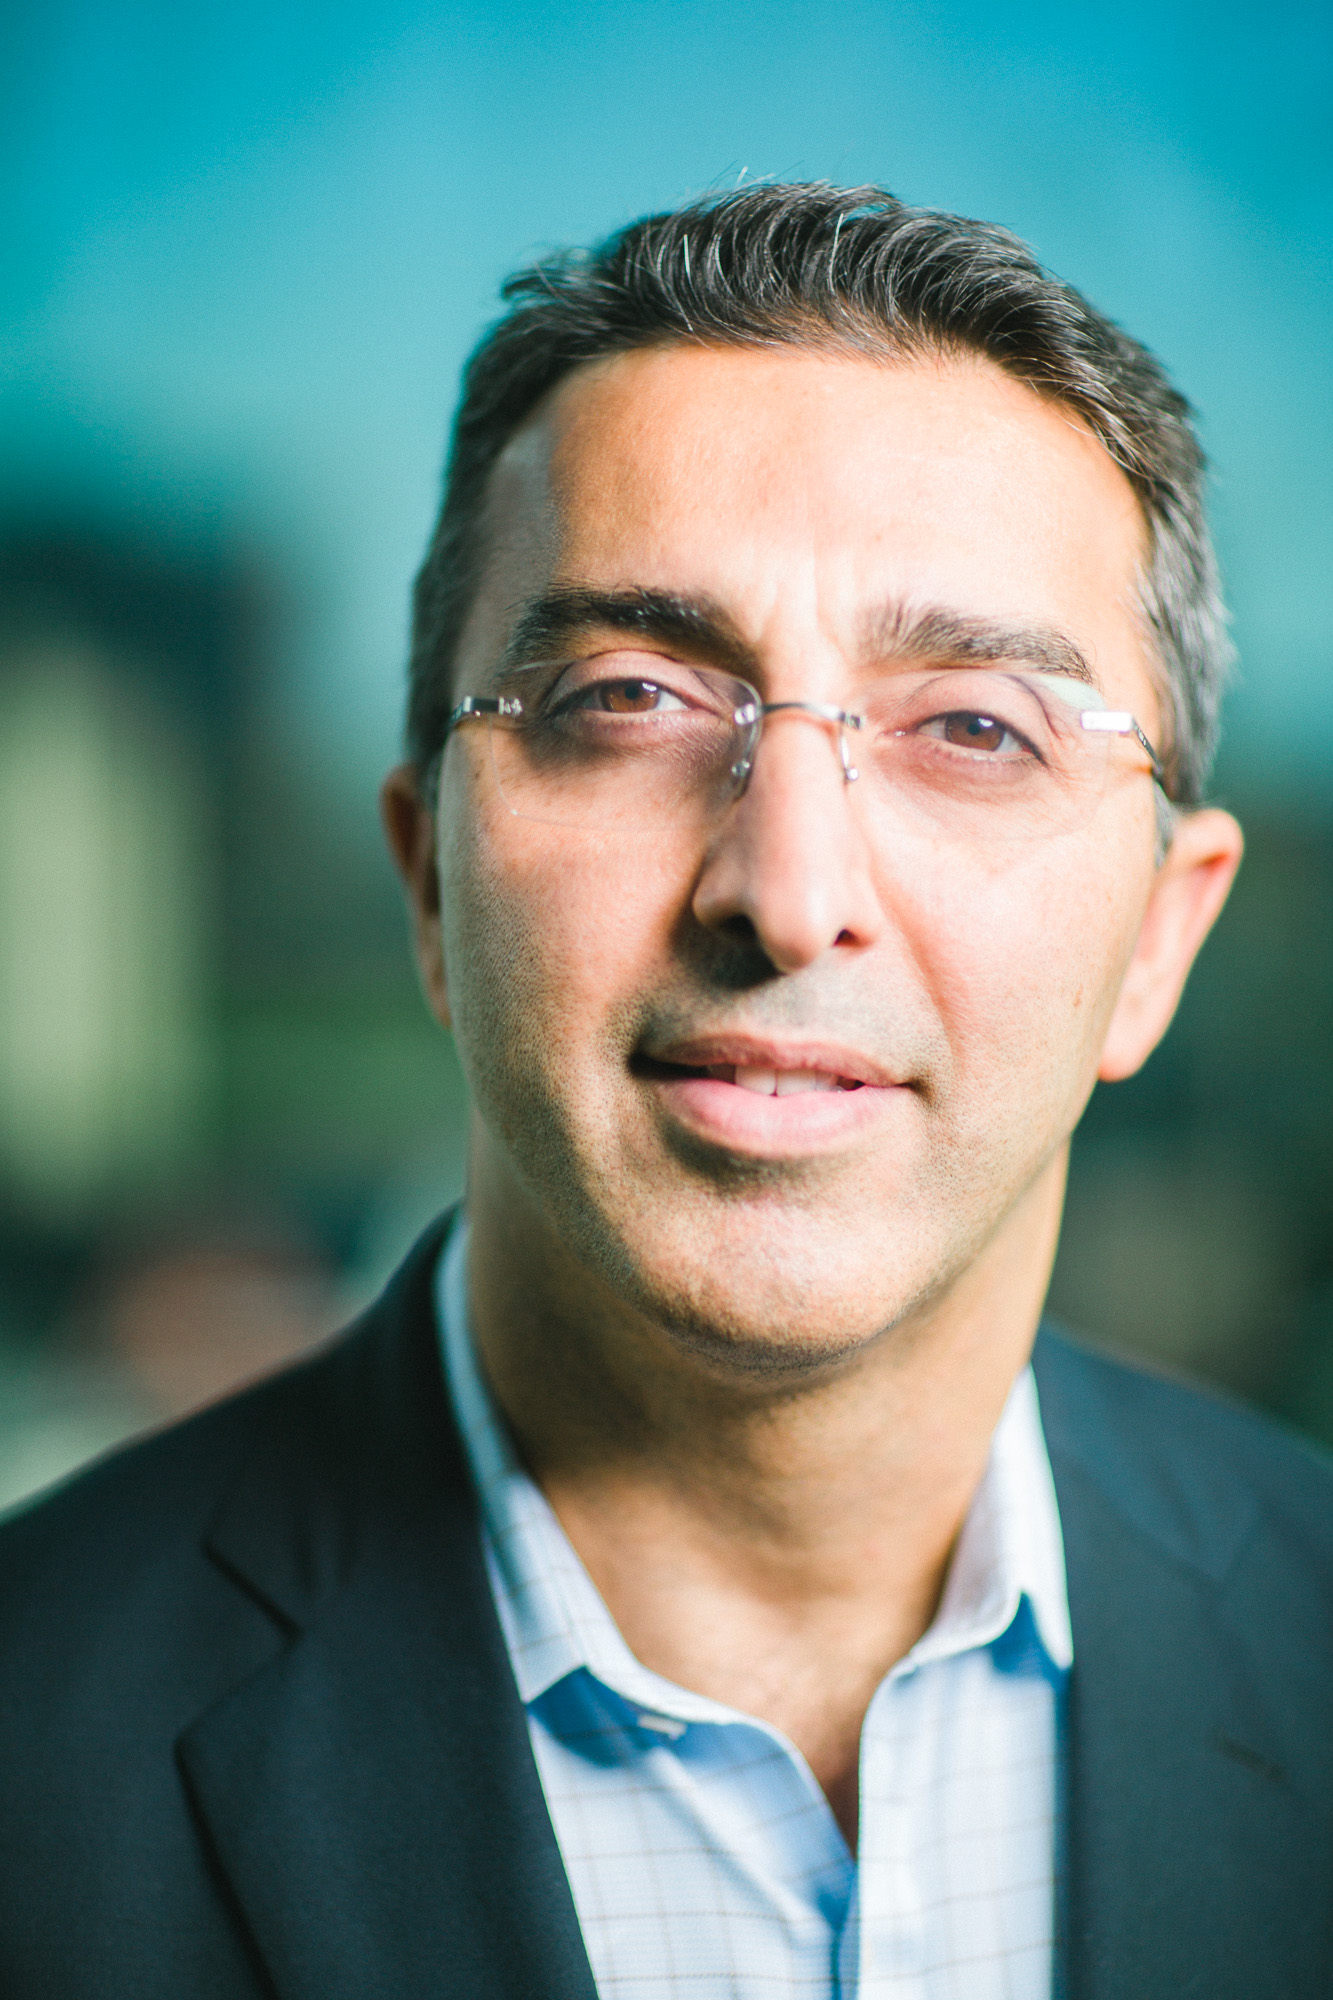 Omid Farokhzad Scientist Headshot Brigham Womens Hospital